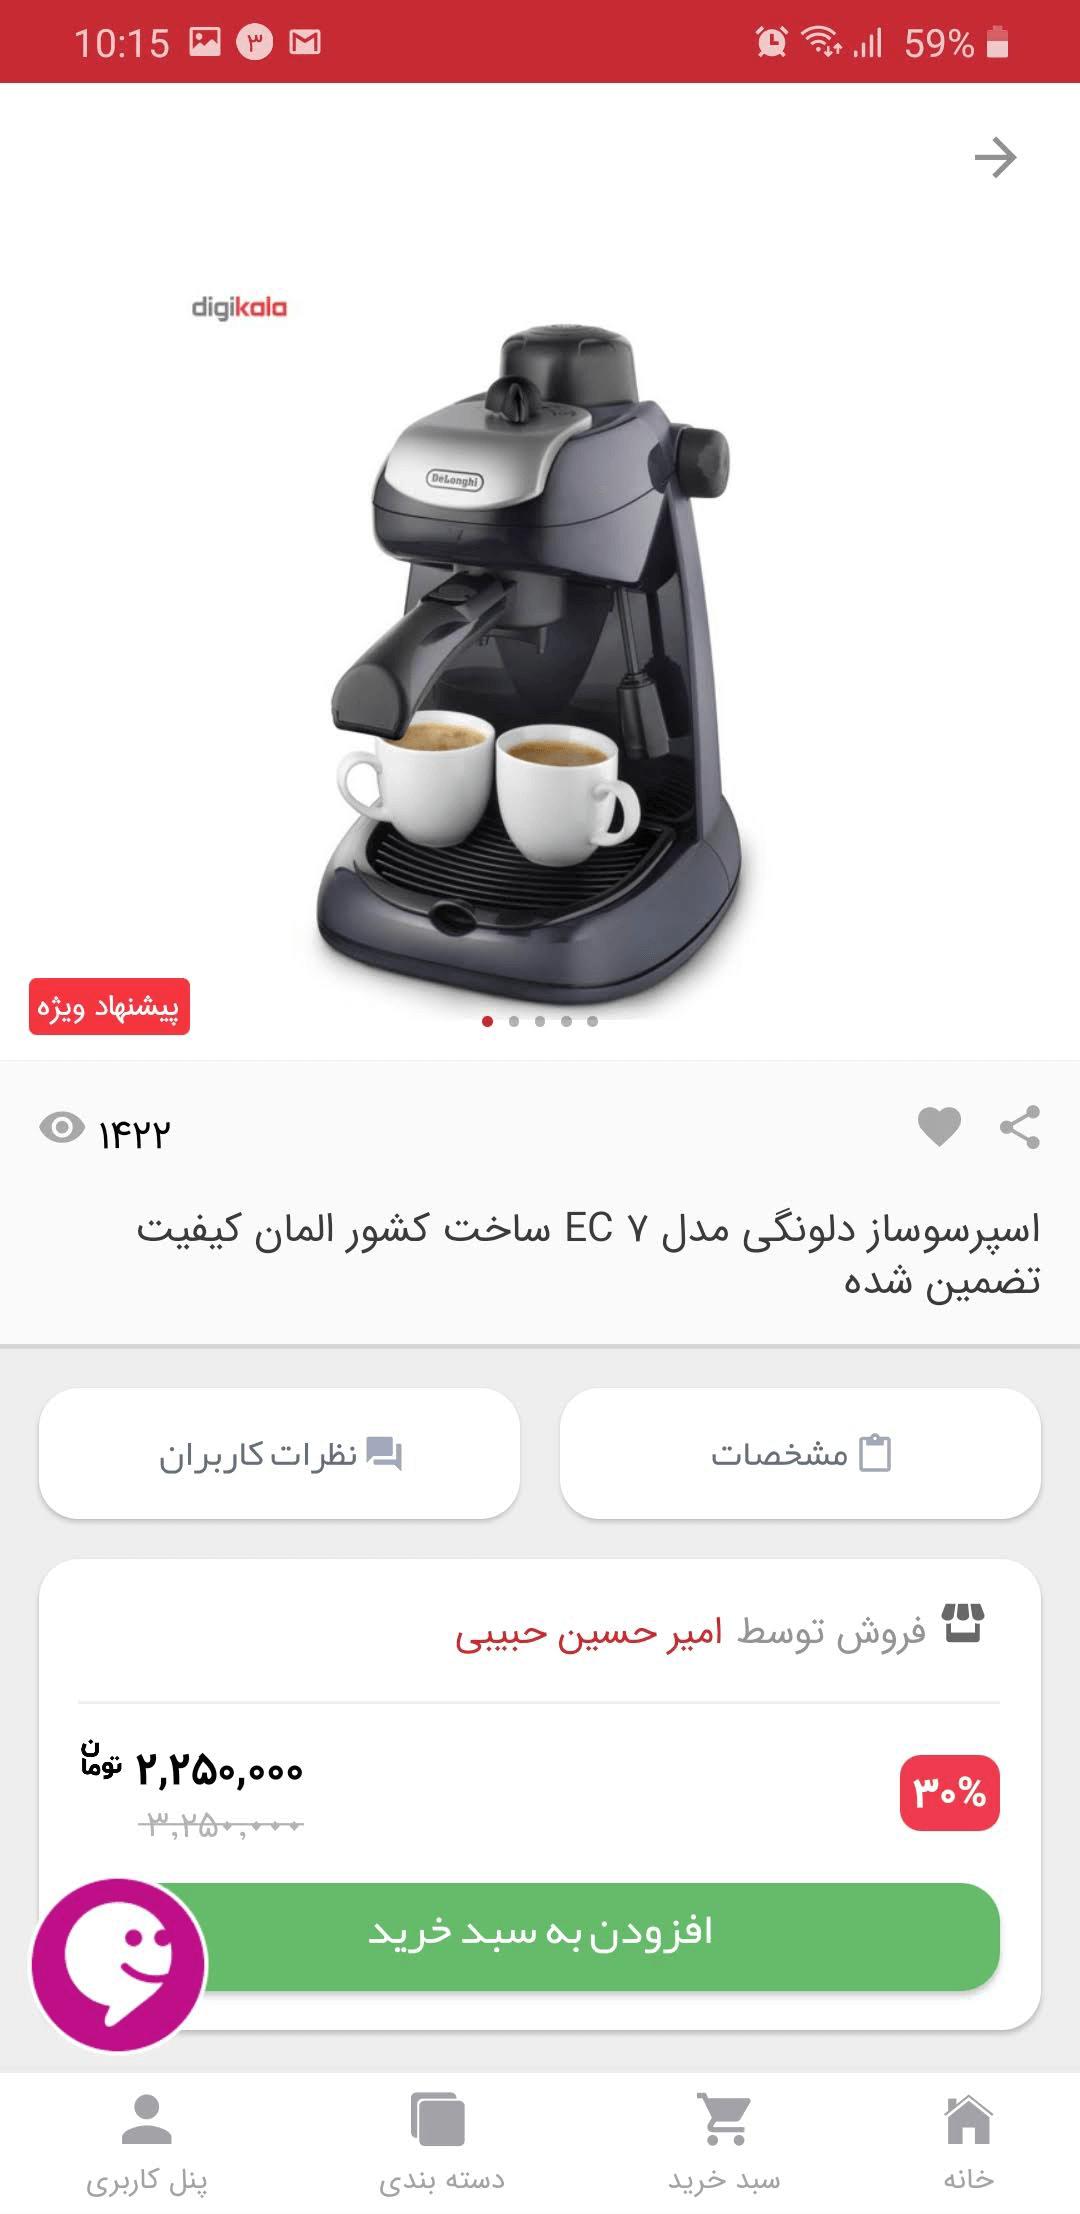 app-screnn (4)